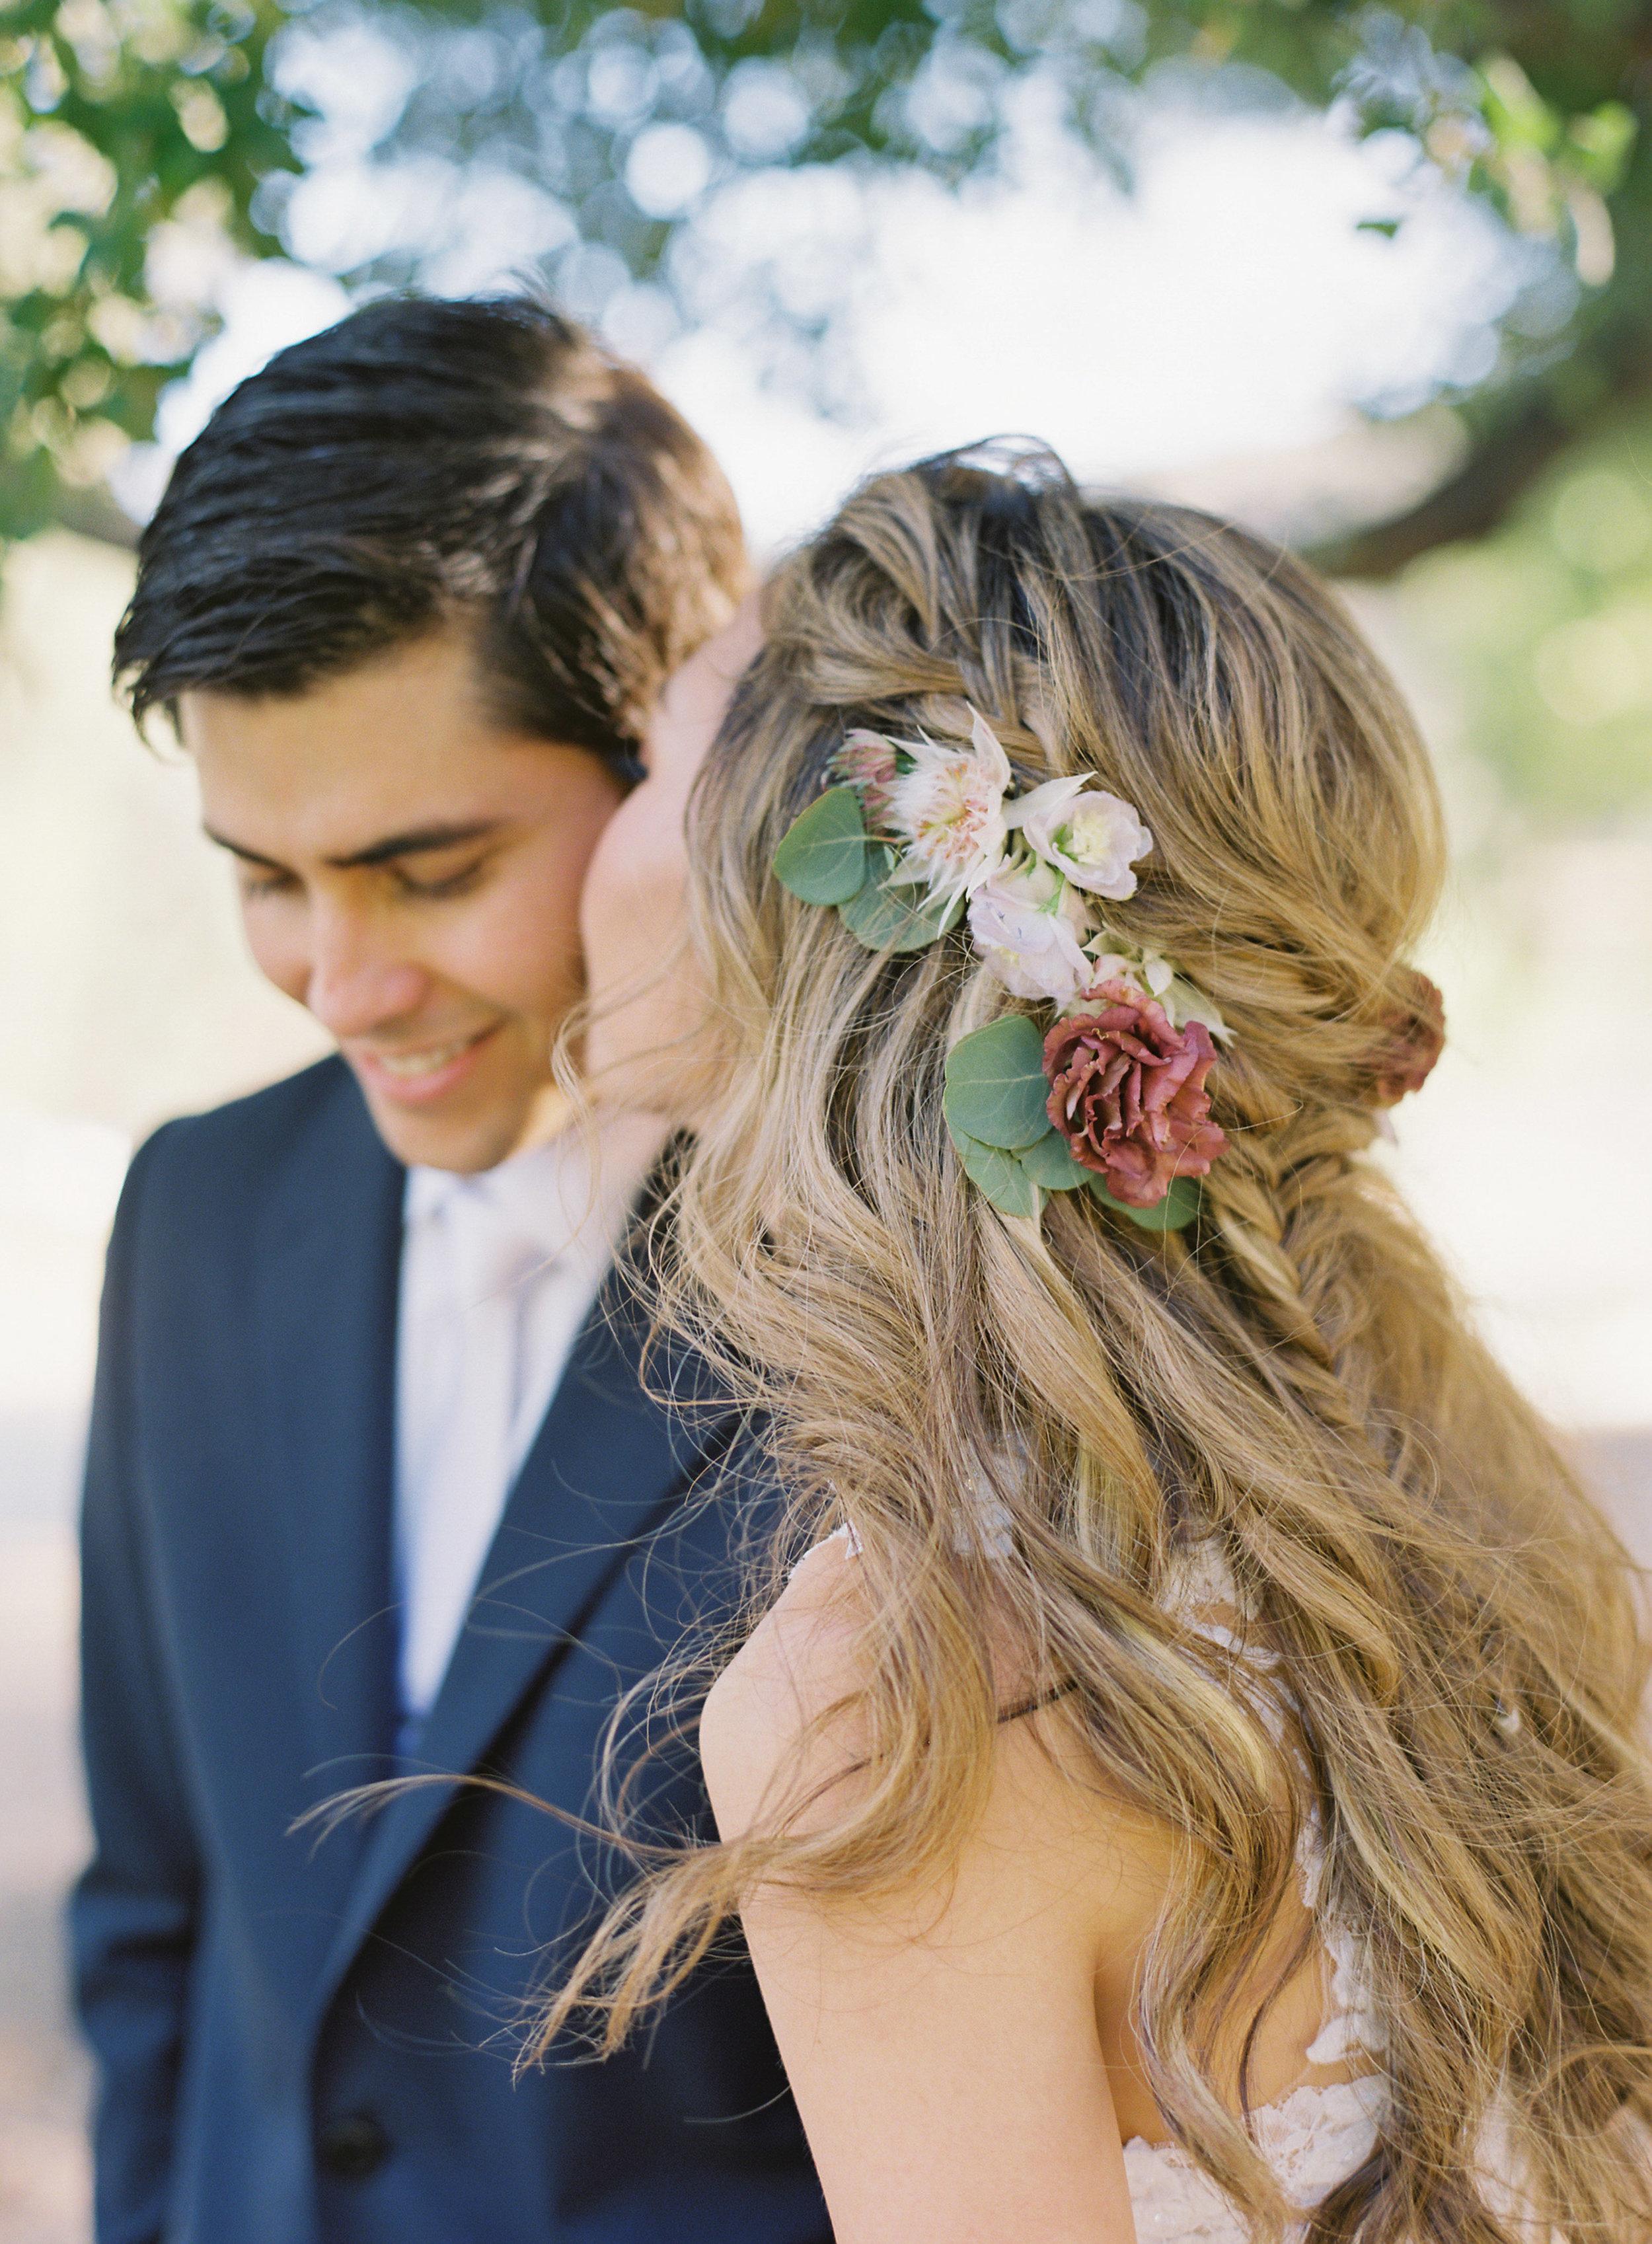 Triunfo_Creek_Winery_Wedding-49-Jen-Huang-JL-357-Jen-Huang-009966-R1-013.jpg